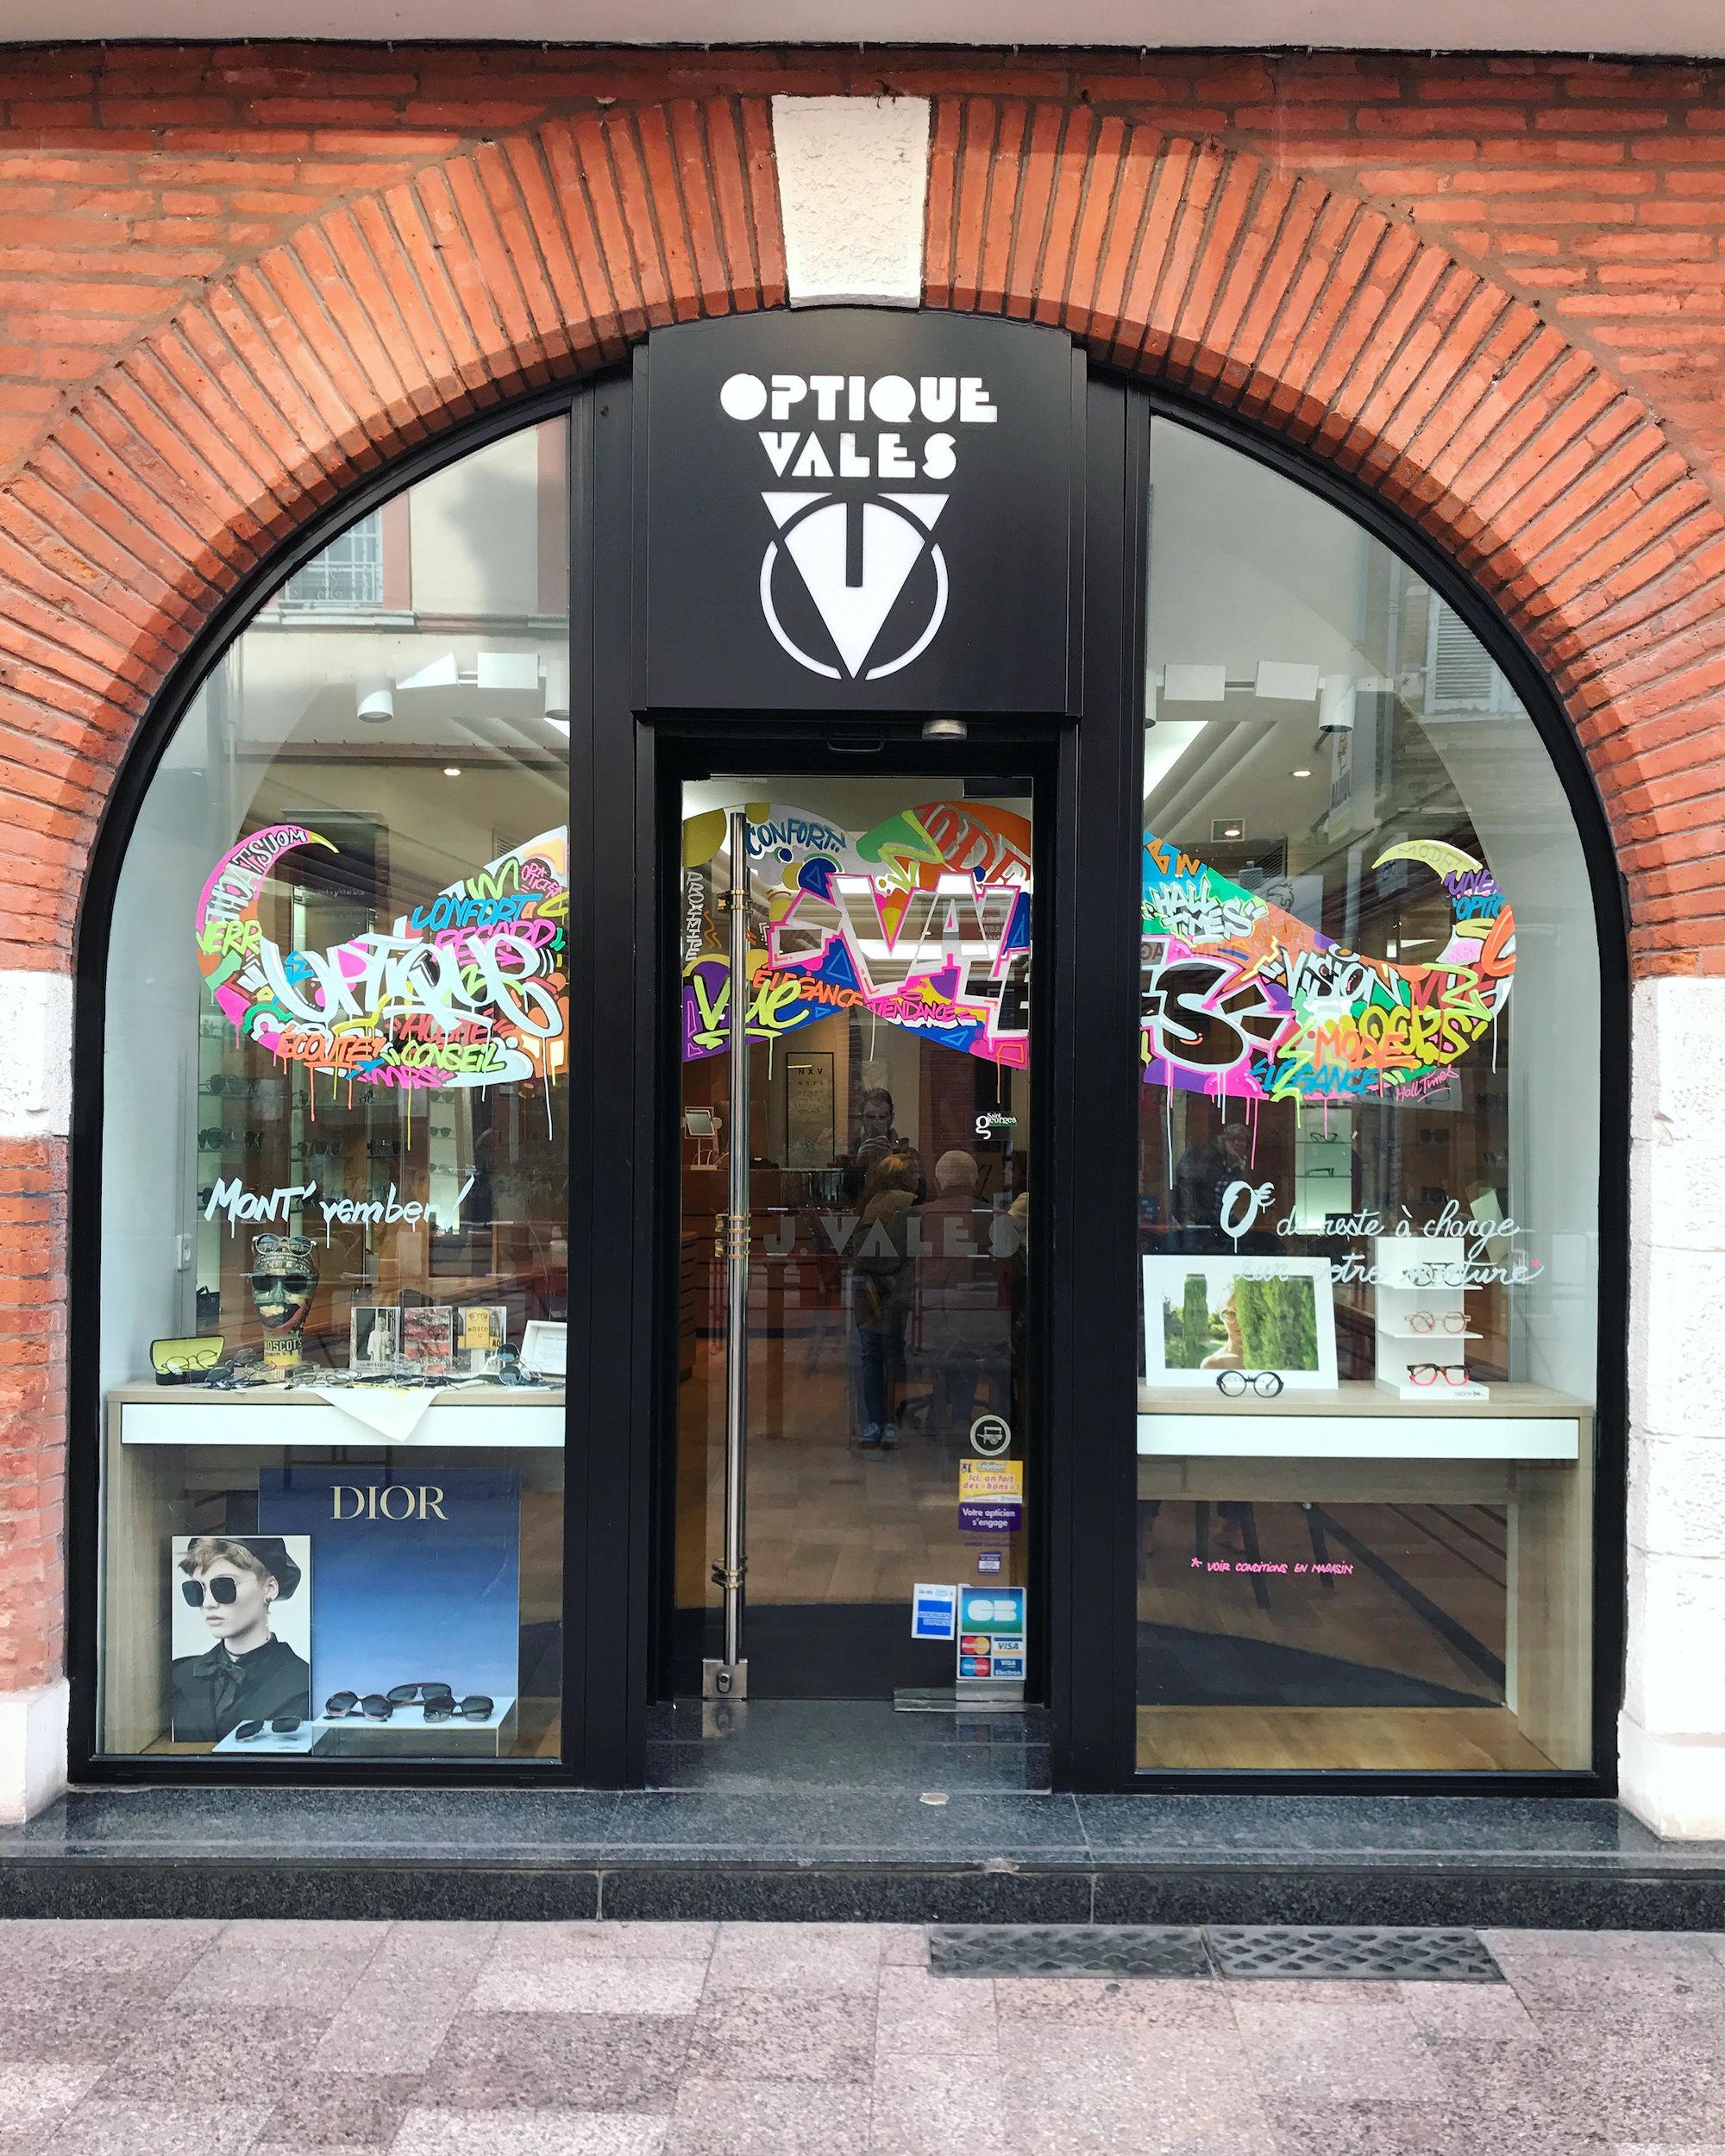 vales opticien graffeur toulouse halltimes decoration peinture streetart vitrine